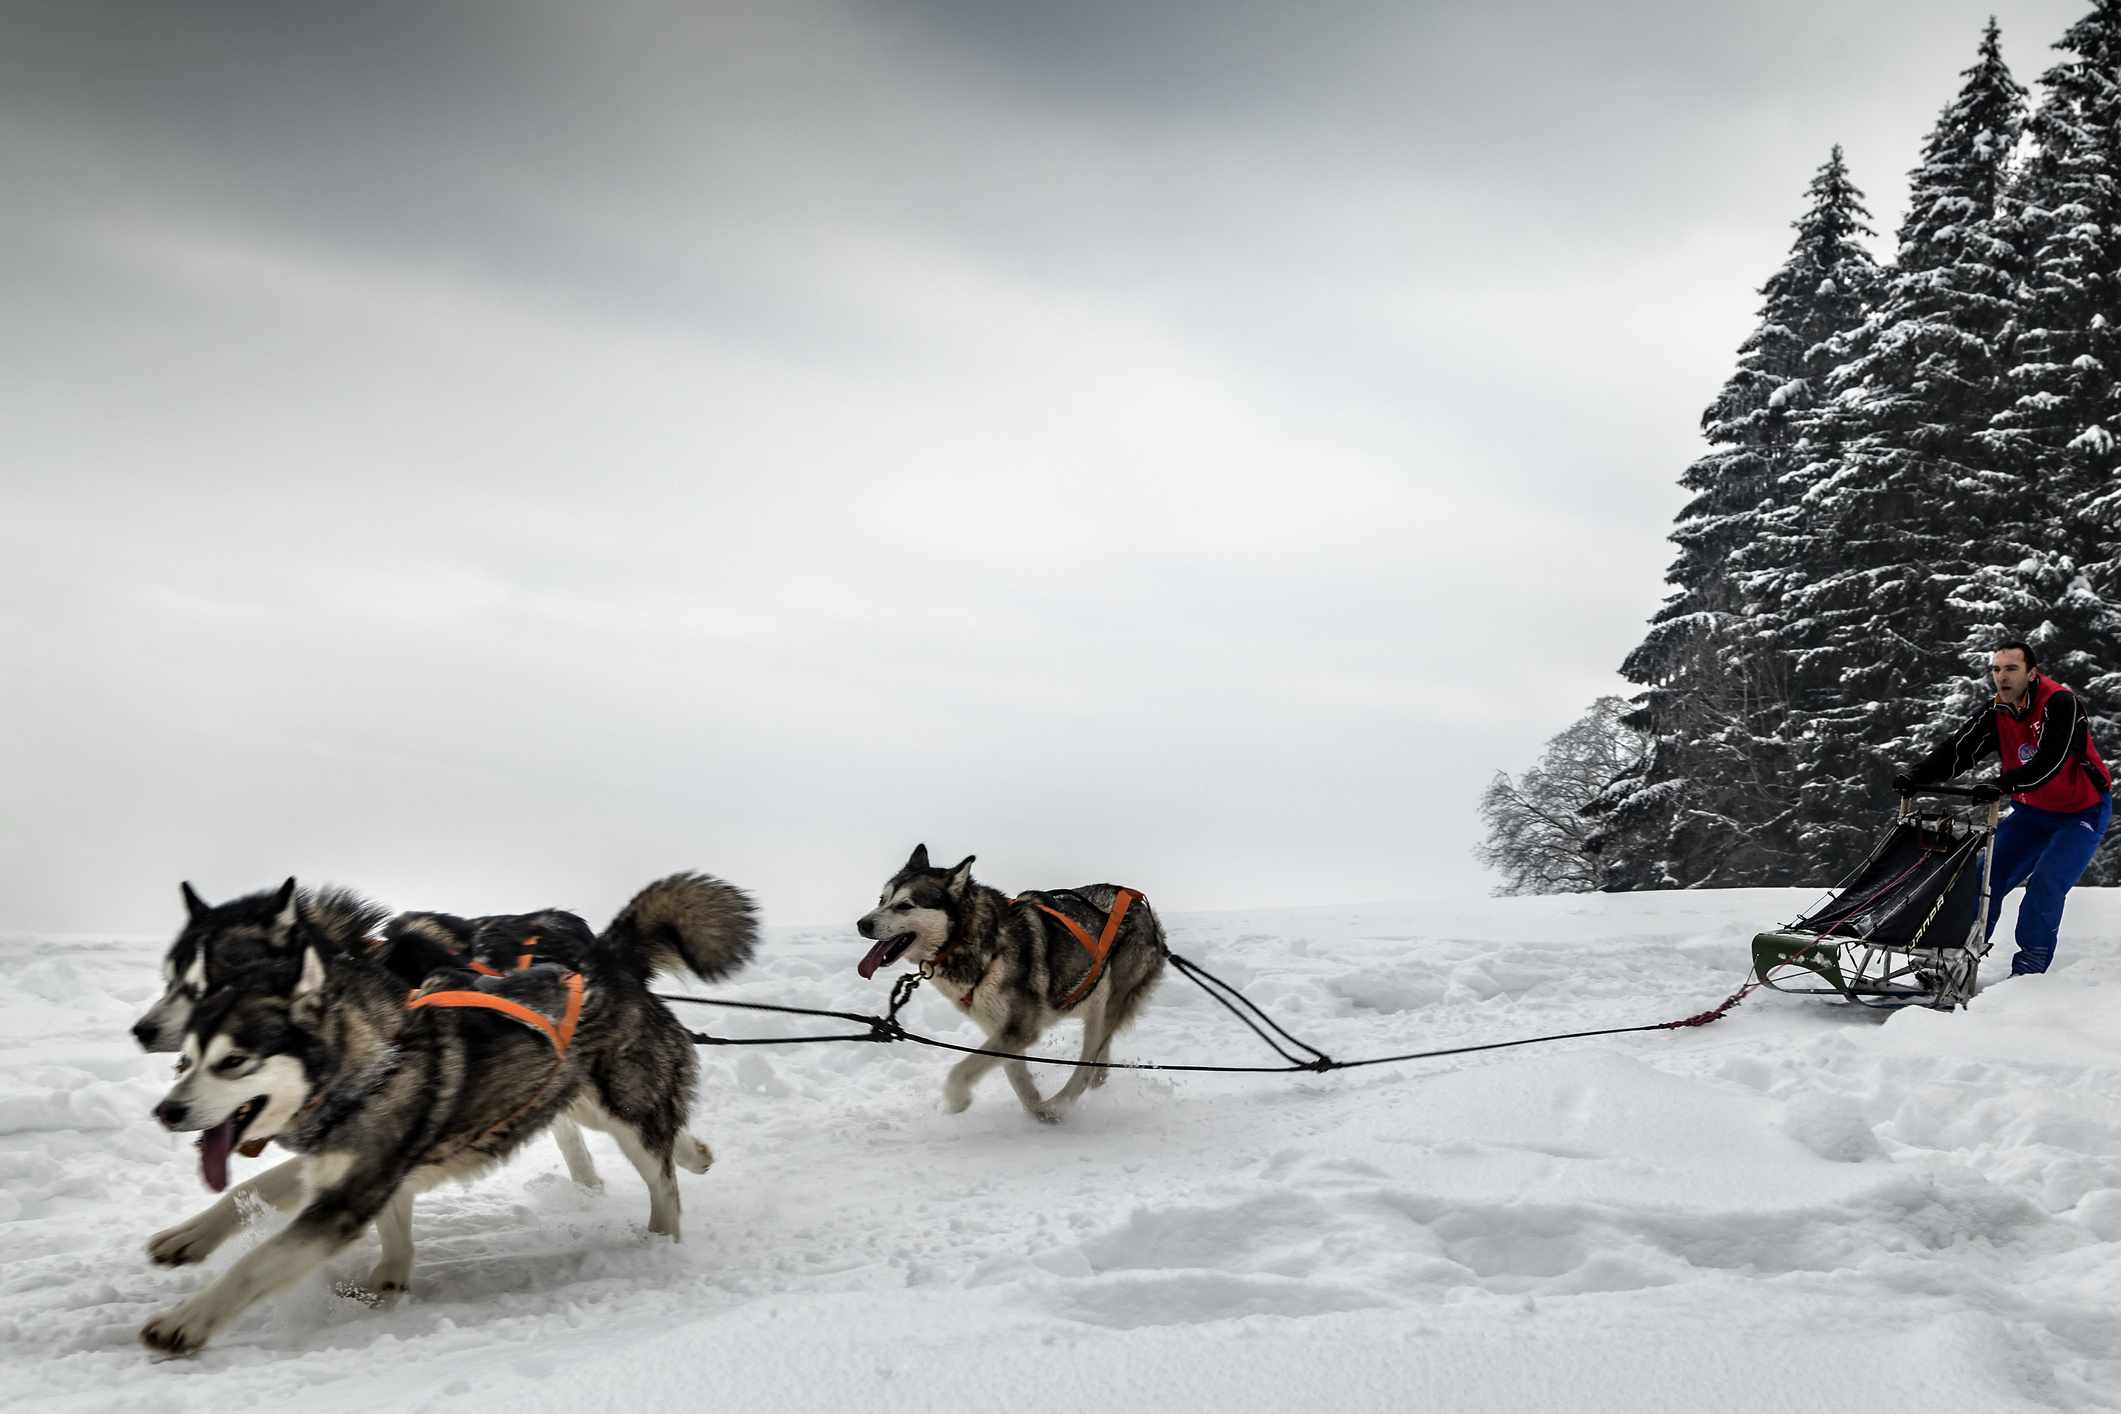 Three Siberian huskies pulling a man on a sled